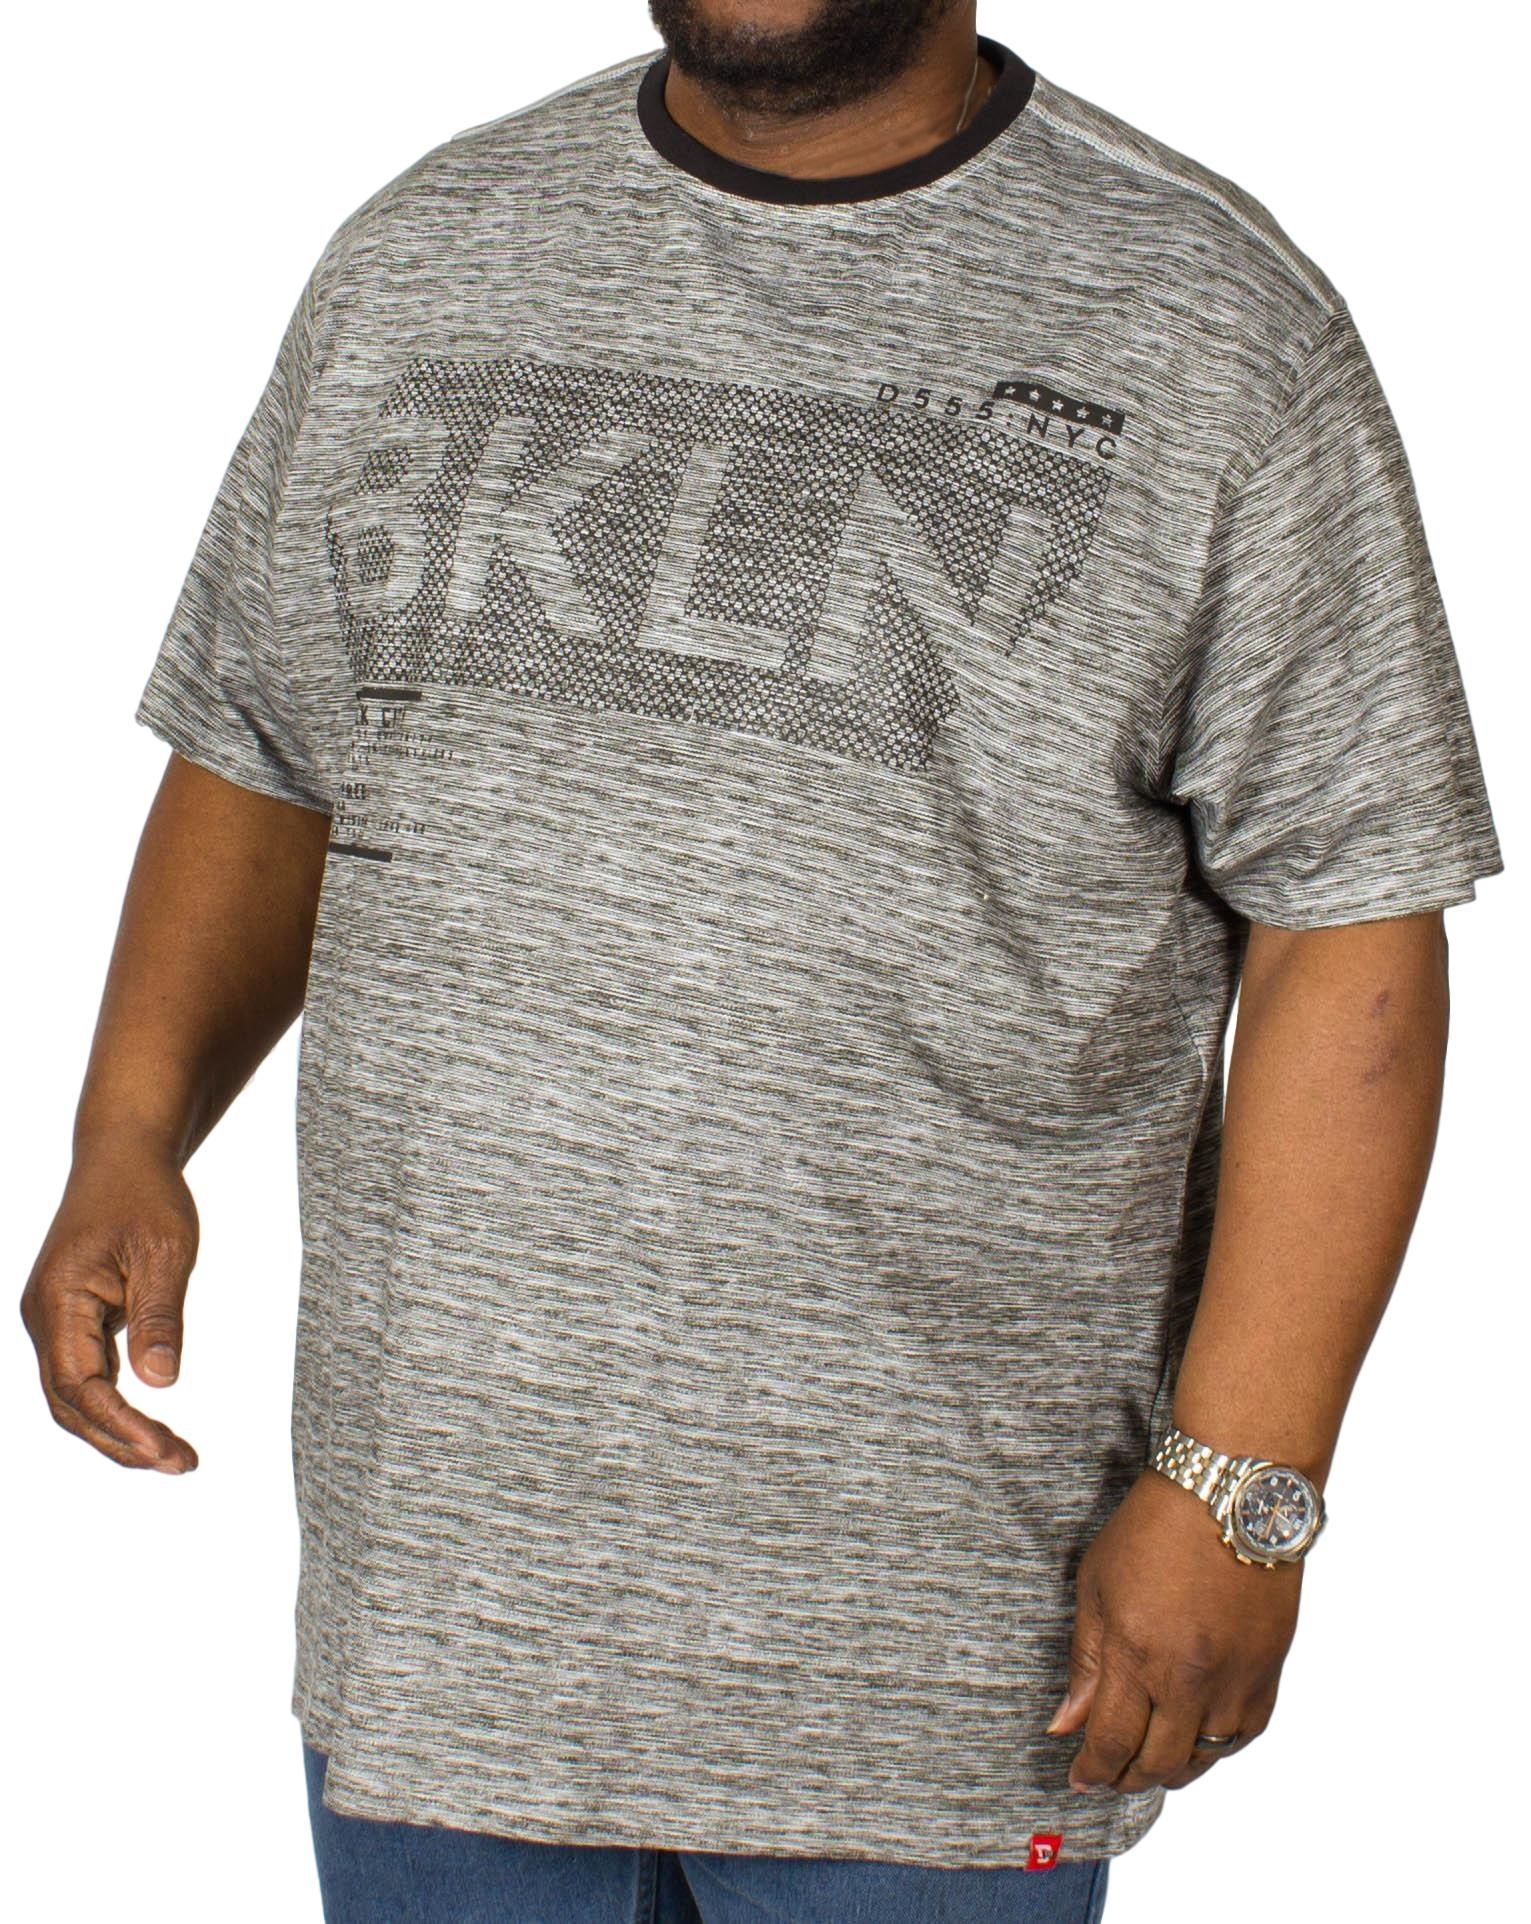 D555 New York Printed T-Shirt Black